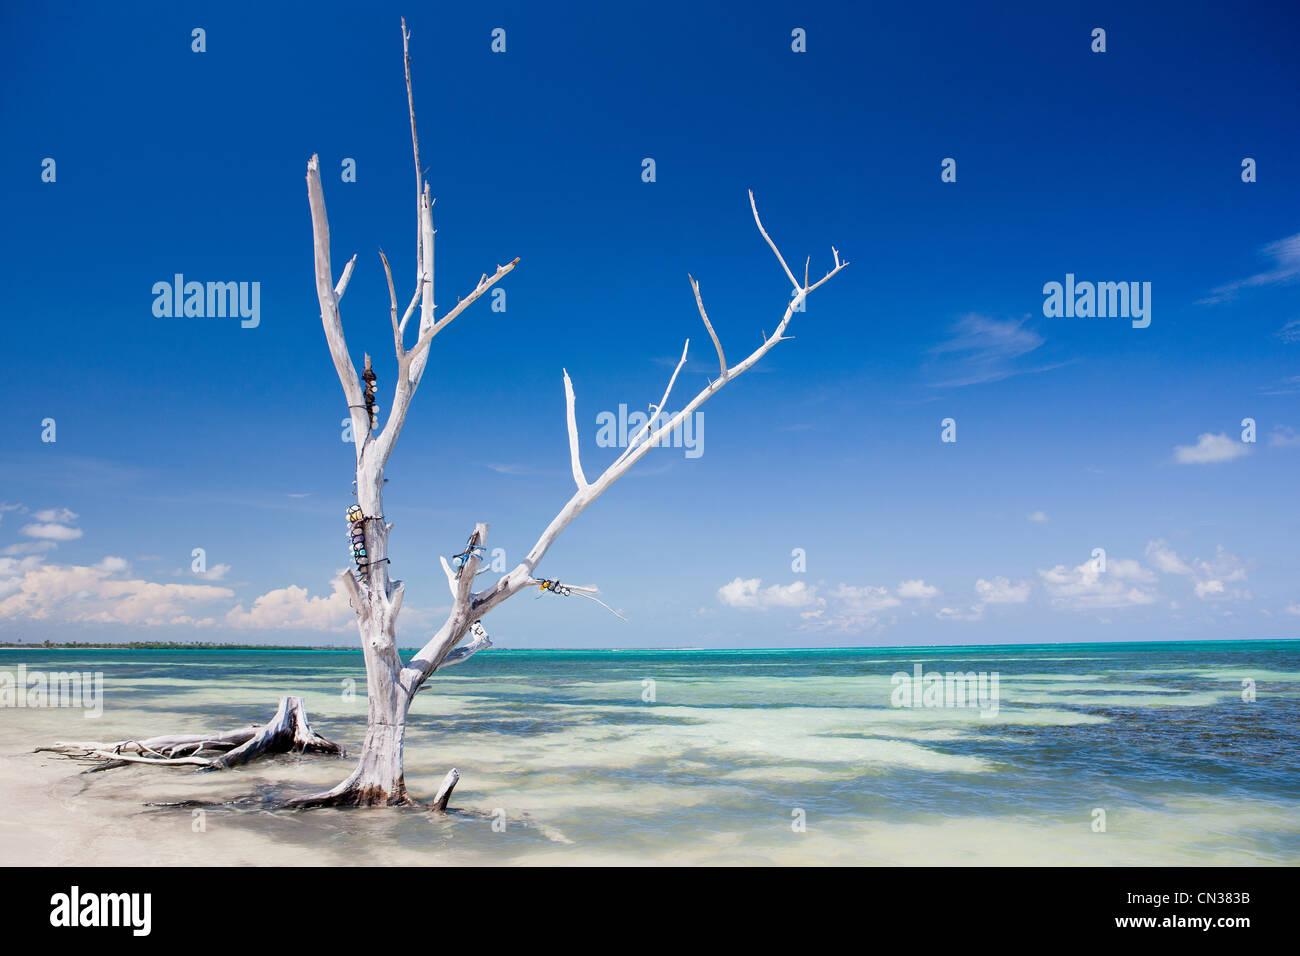 Tree on beach, Punta Allen, Yucatan, Mexico - Stock Image